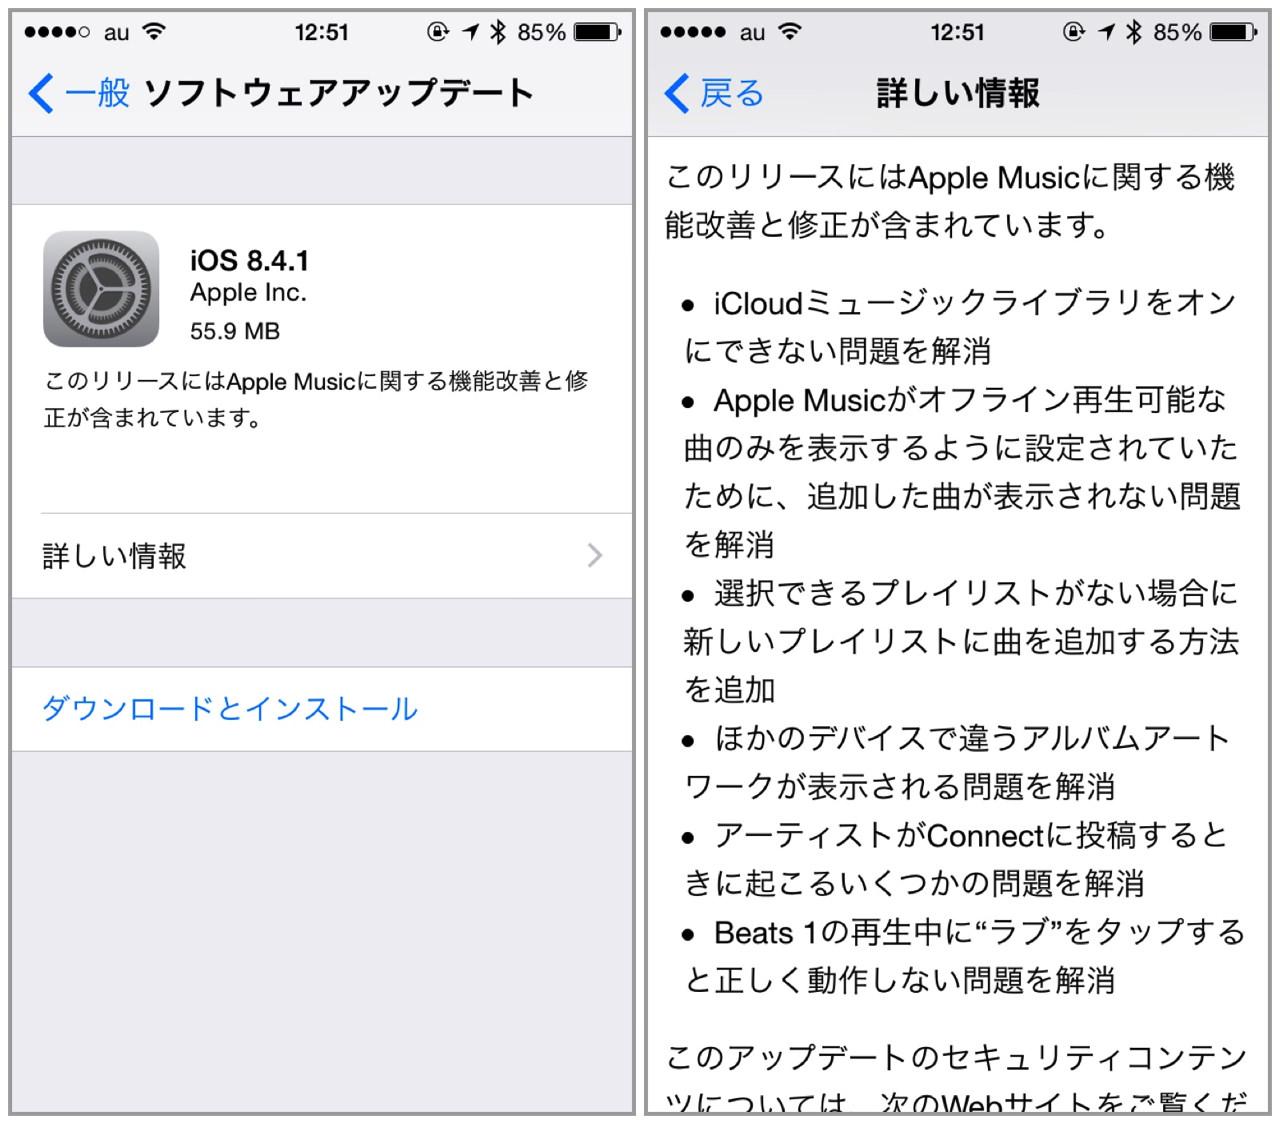 iOSソフトウェアアップデート8.4.1